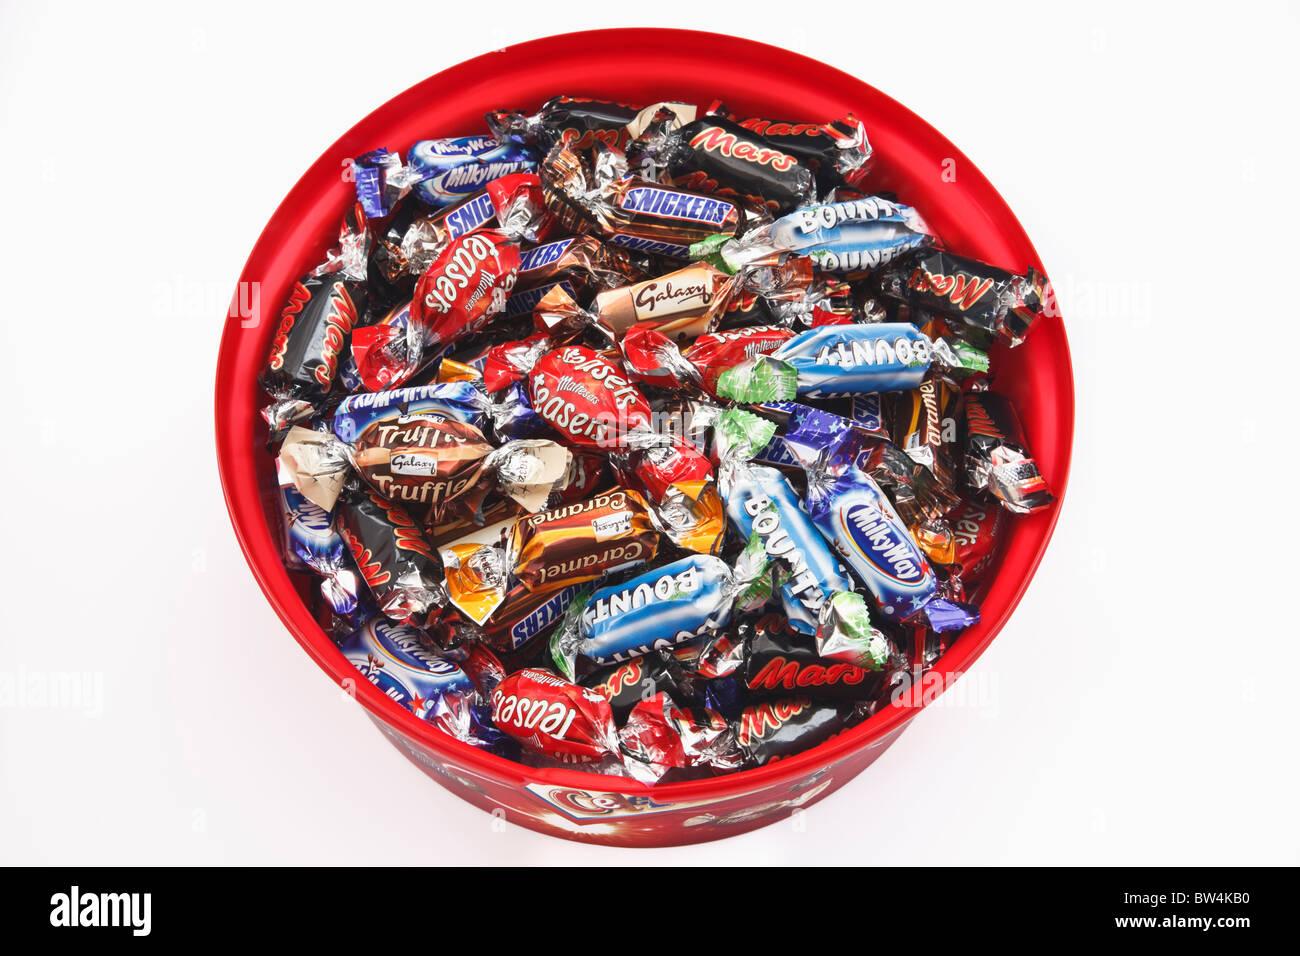 Chocolates In Celebrations Box